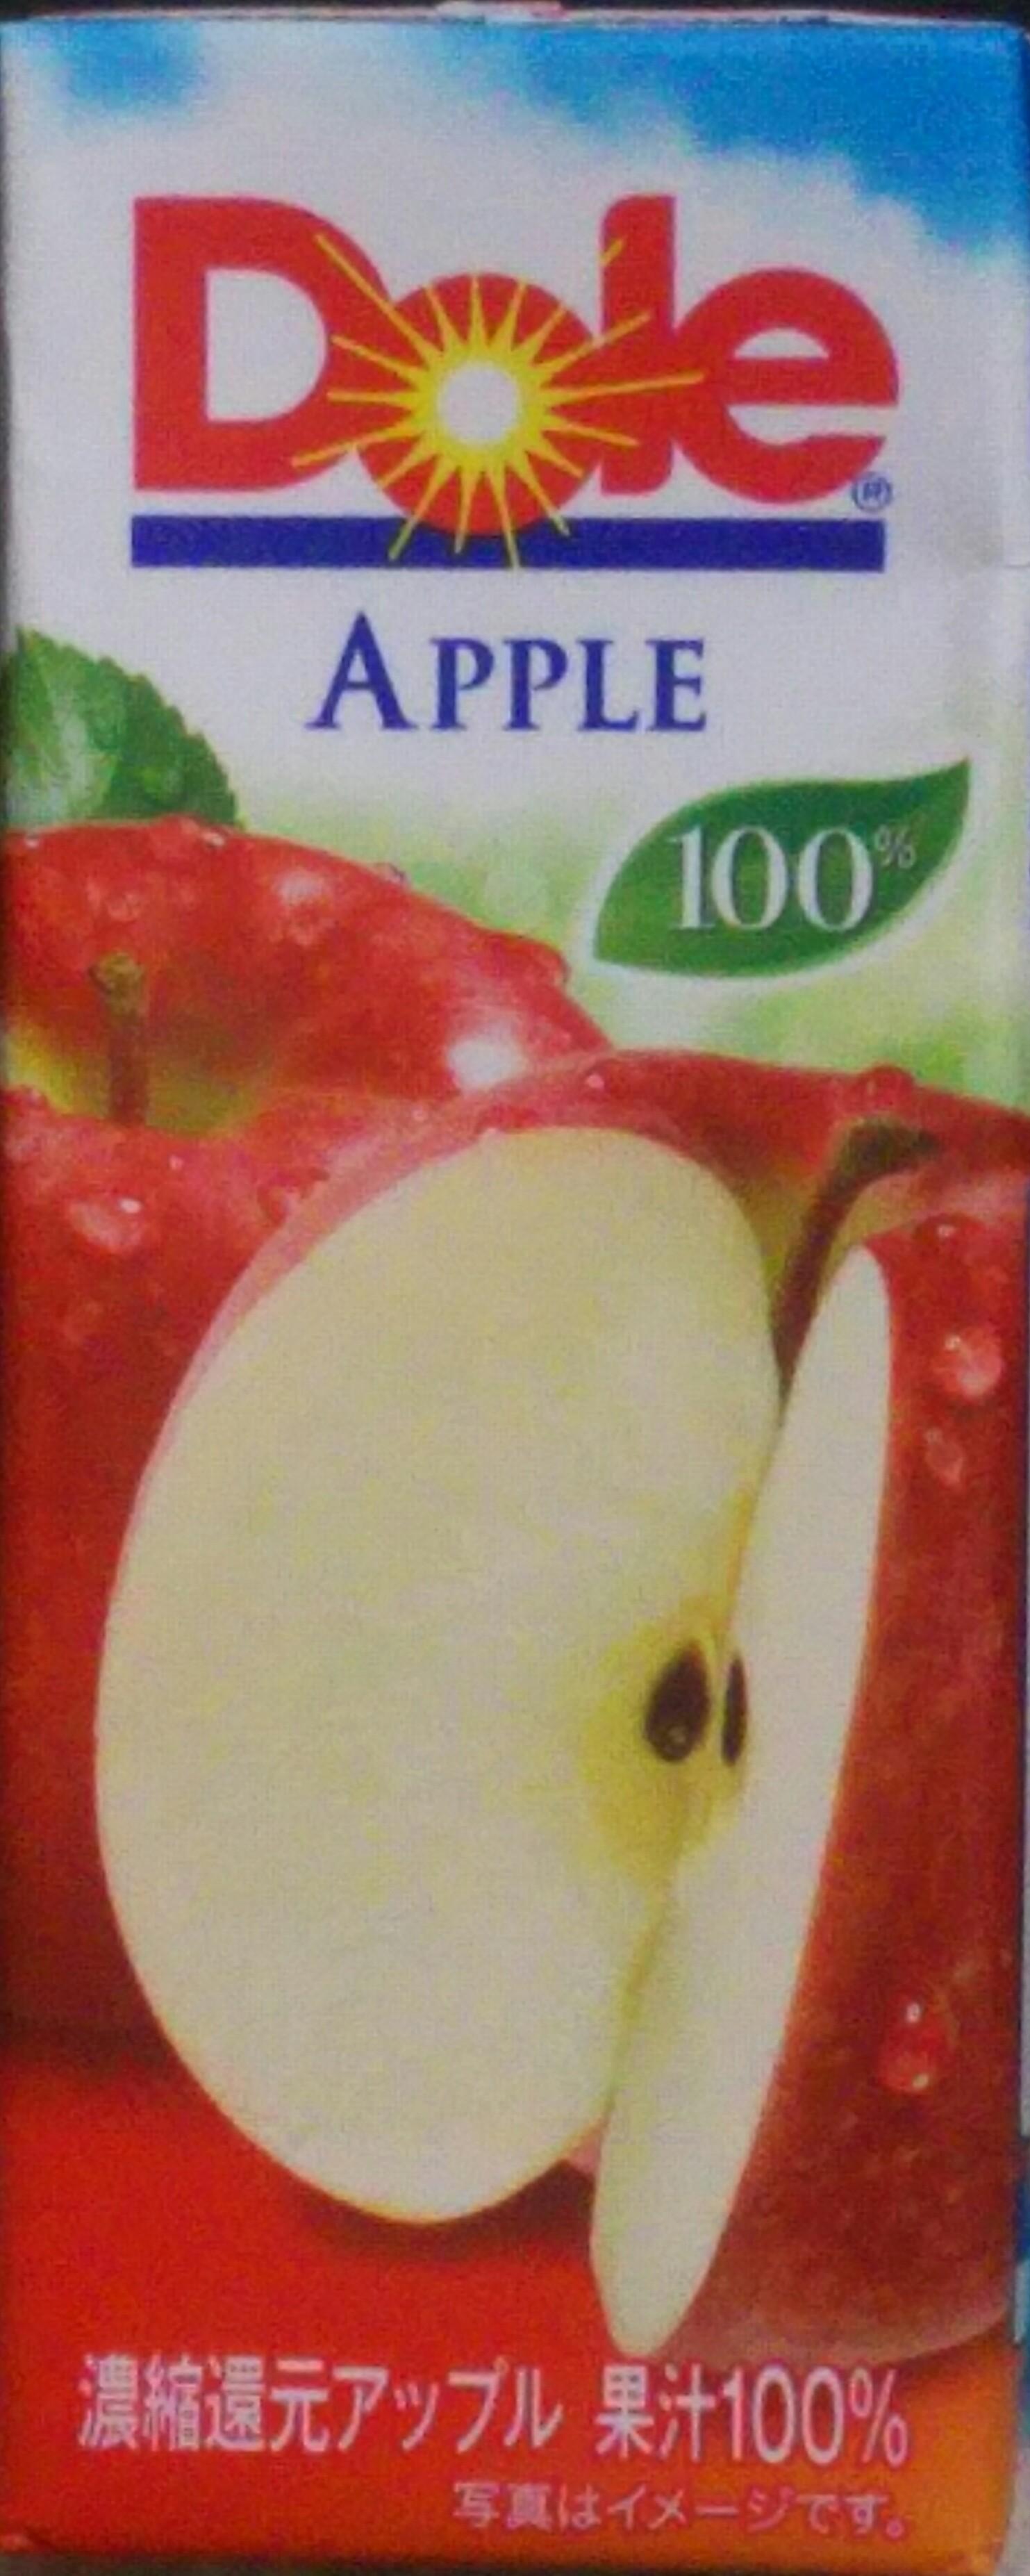 Dole®アップル100%(雪印メグミルク)感想・レビュー